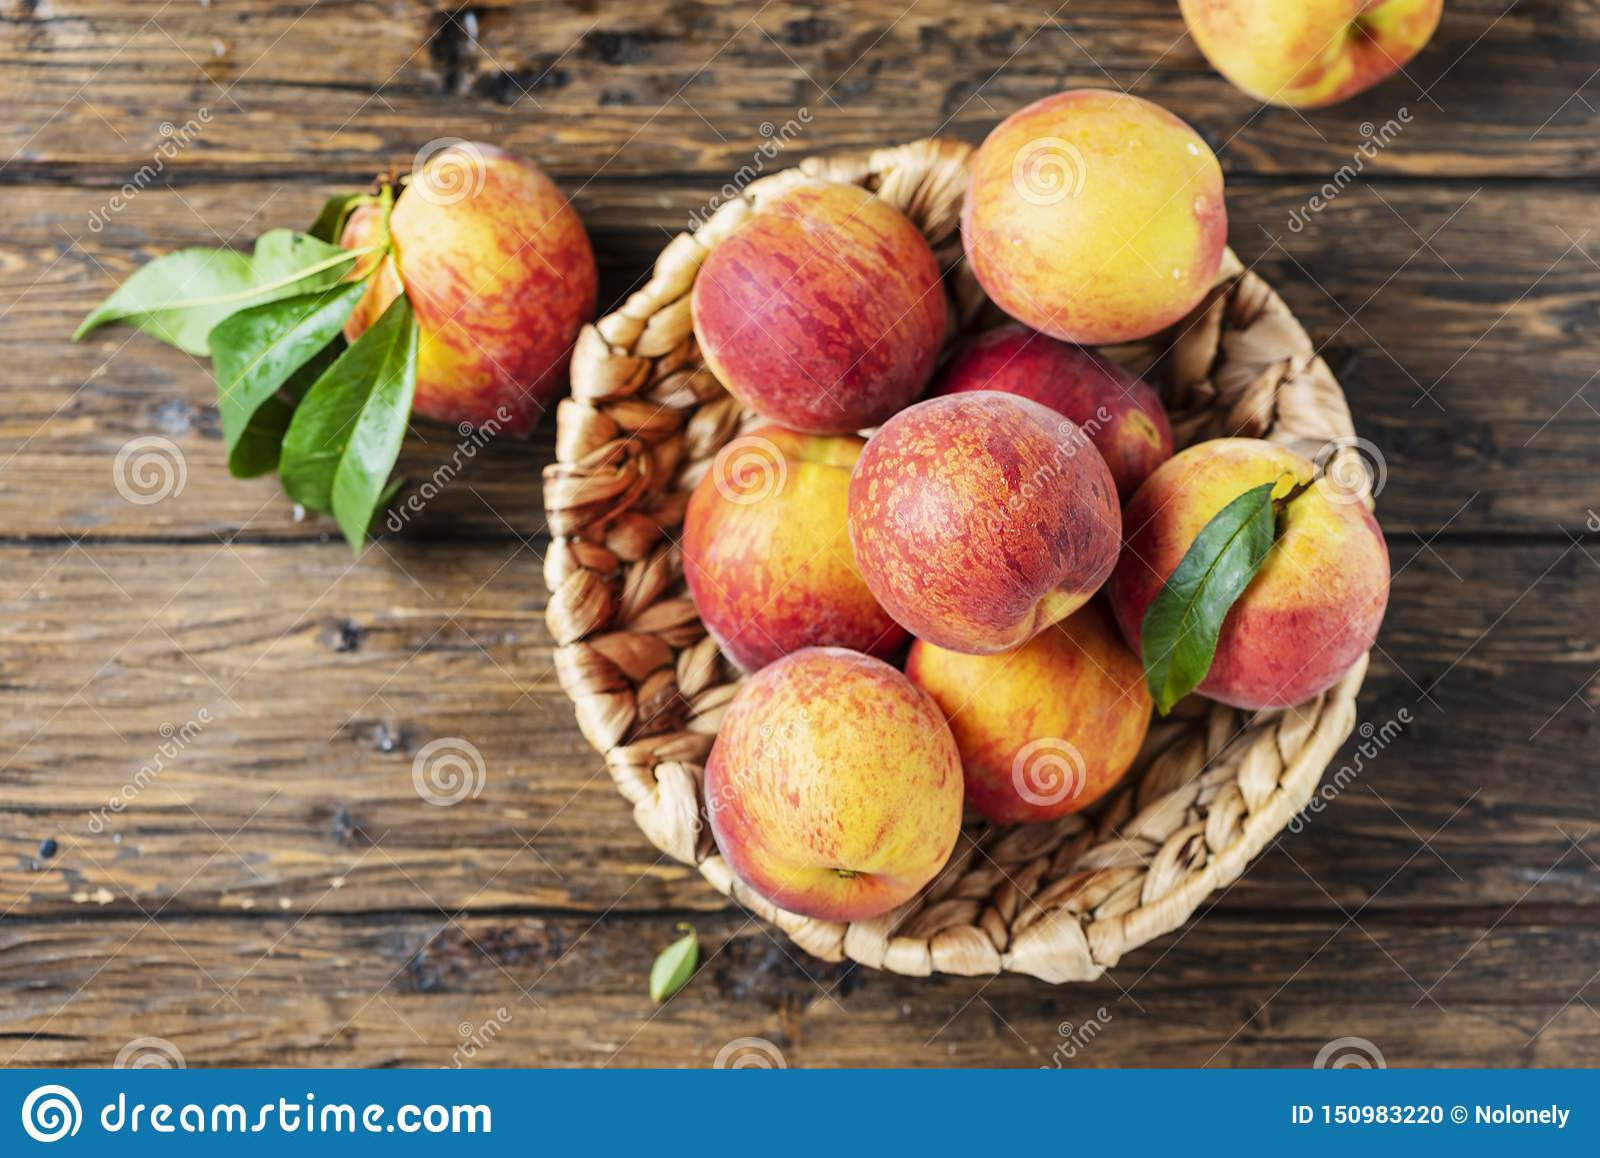 Verse zoete perziken